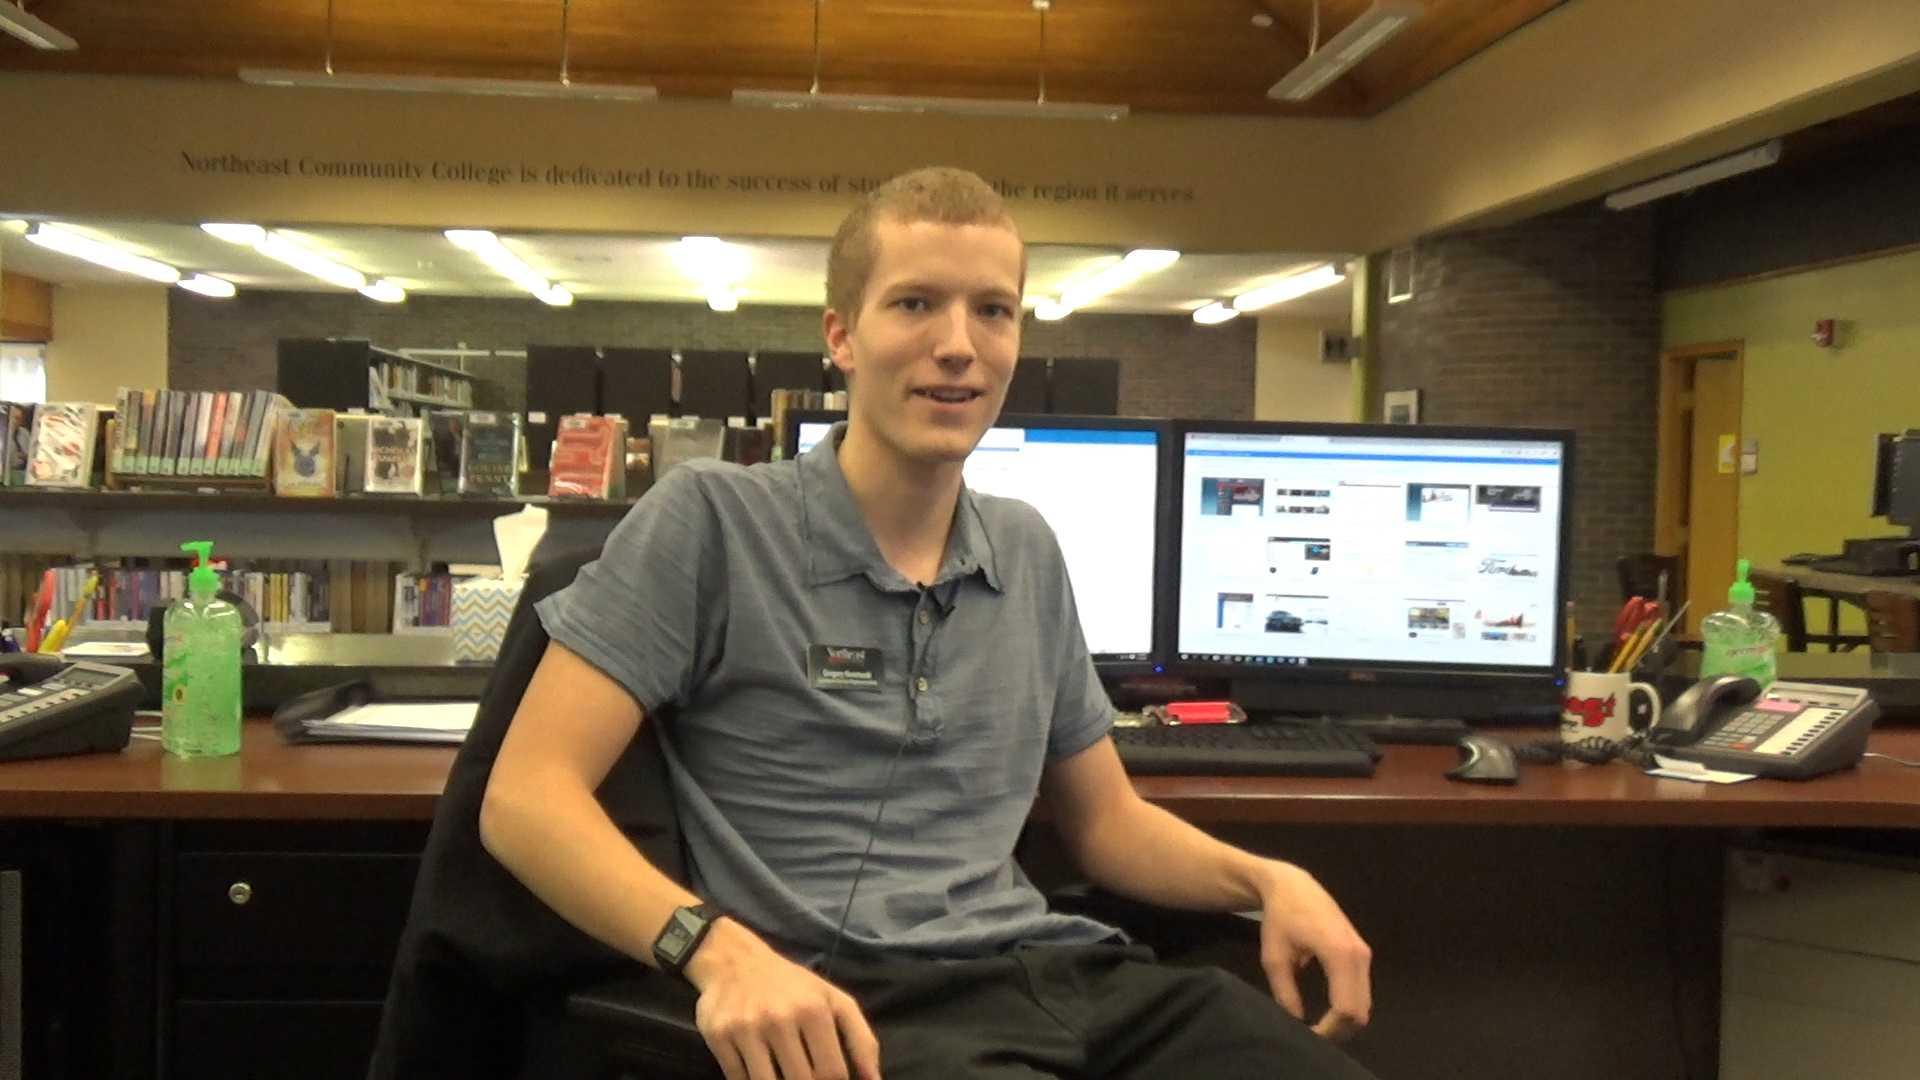 Gregory Kosmacek, Customer Service Representative at the Northeast Help Desk